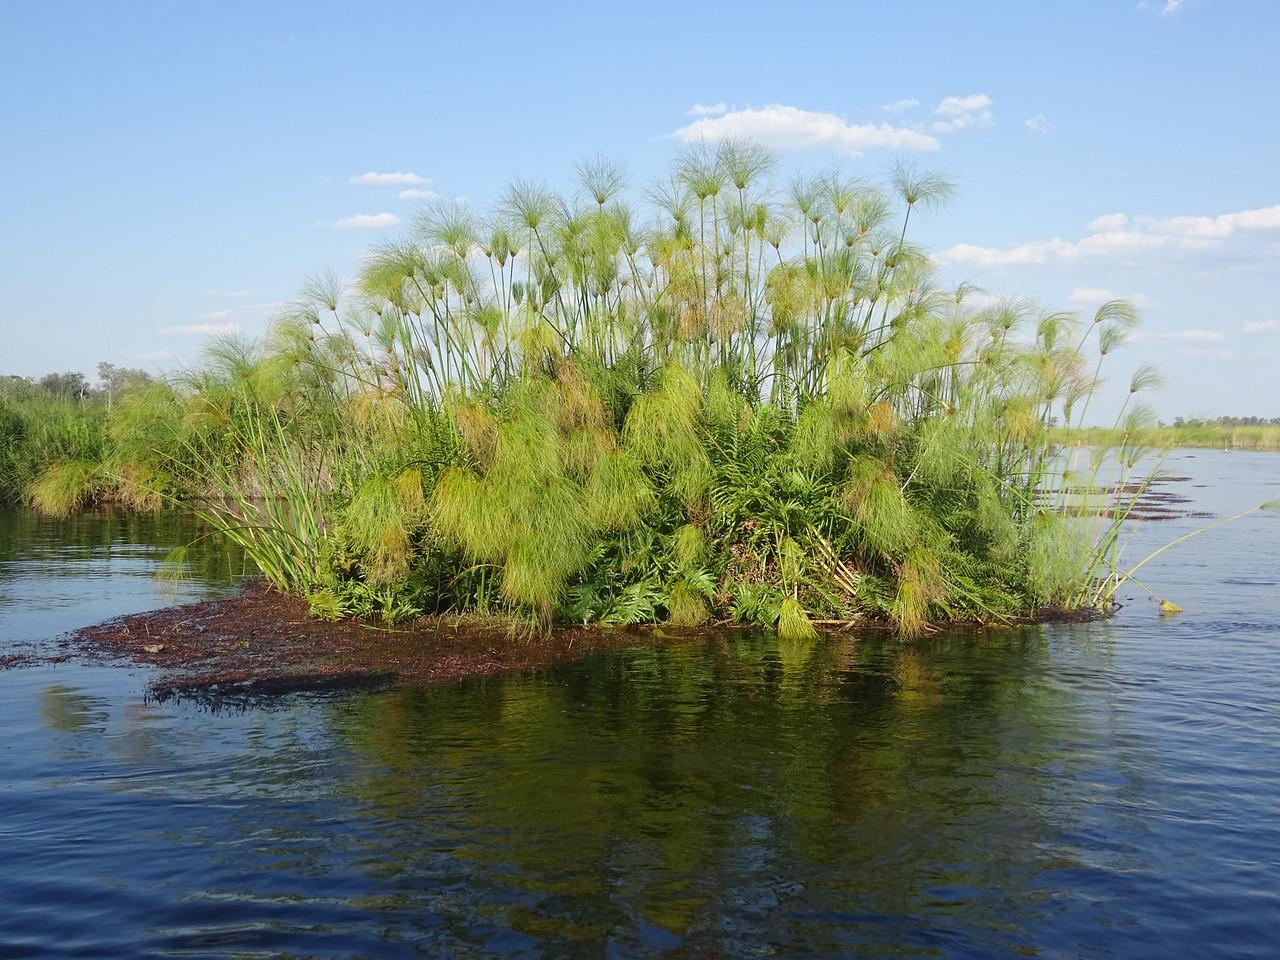 108_Okavango Delta, Moremi Game Reserve  Waterways Safari  Floating Vegetation  Papyrus  Paper, floor mats, canoe